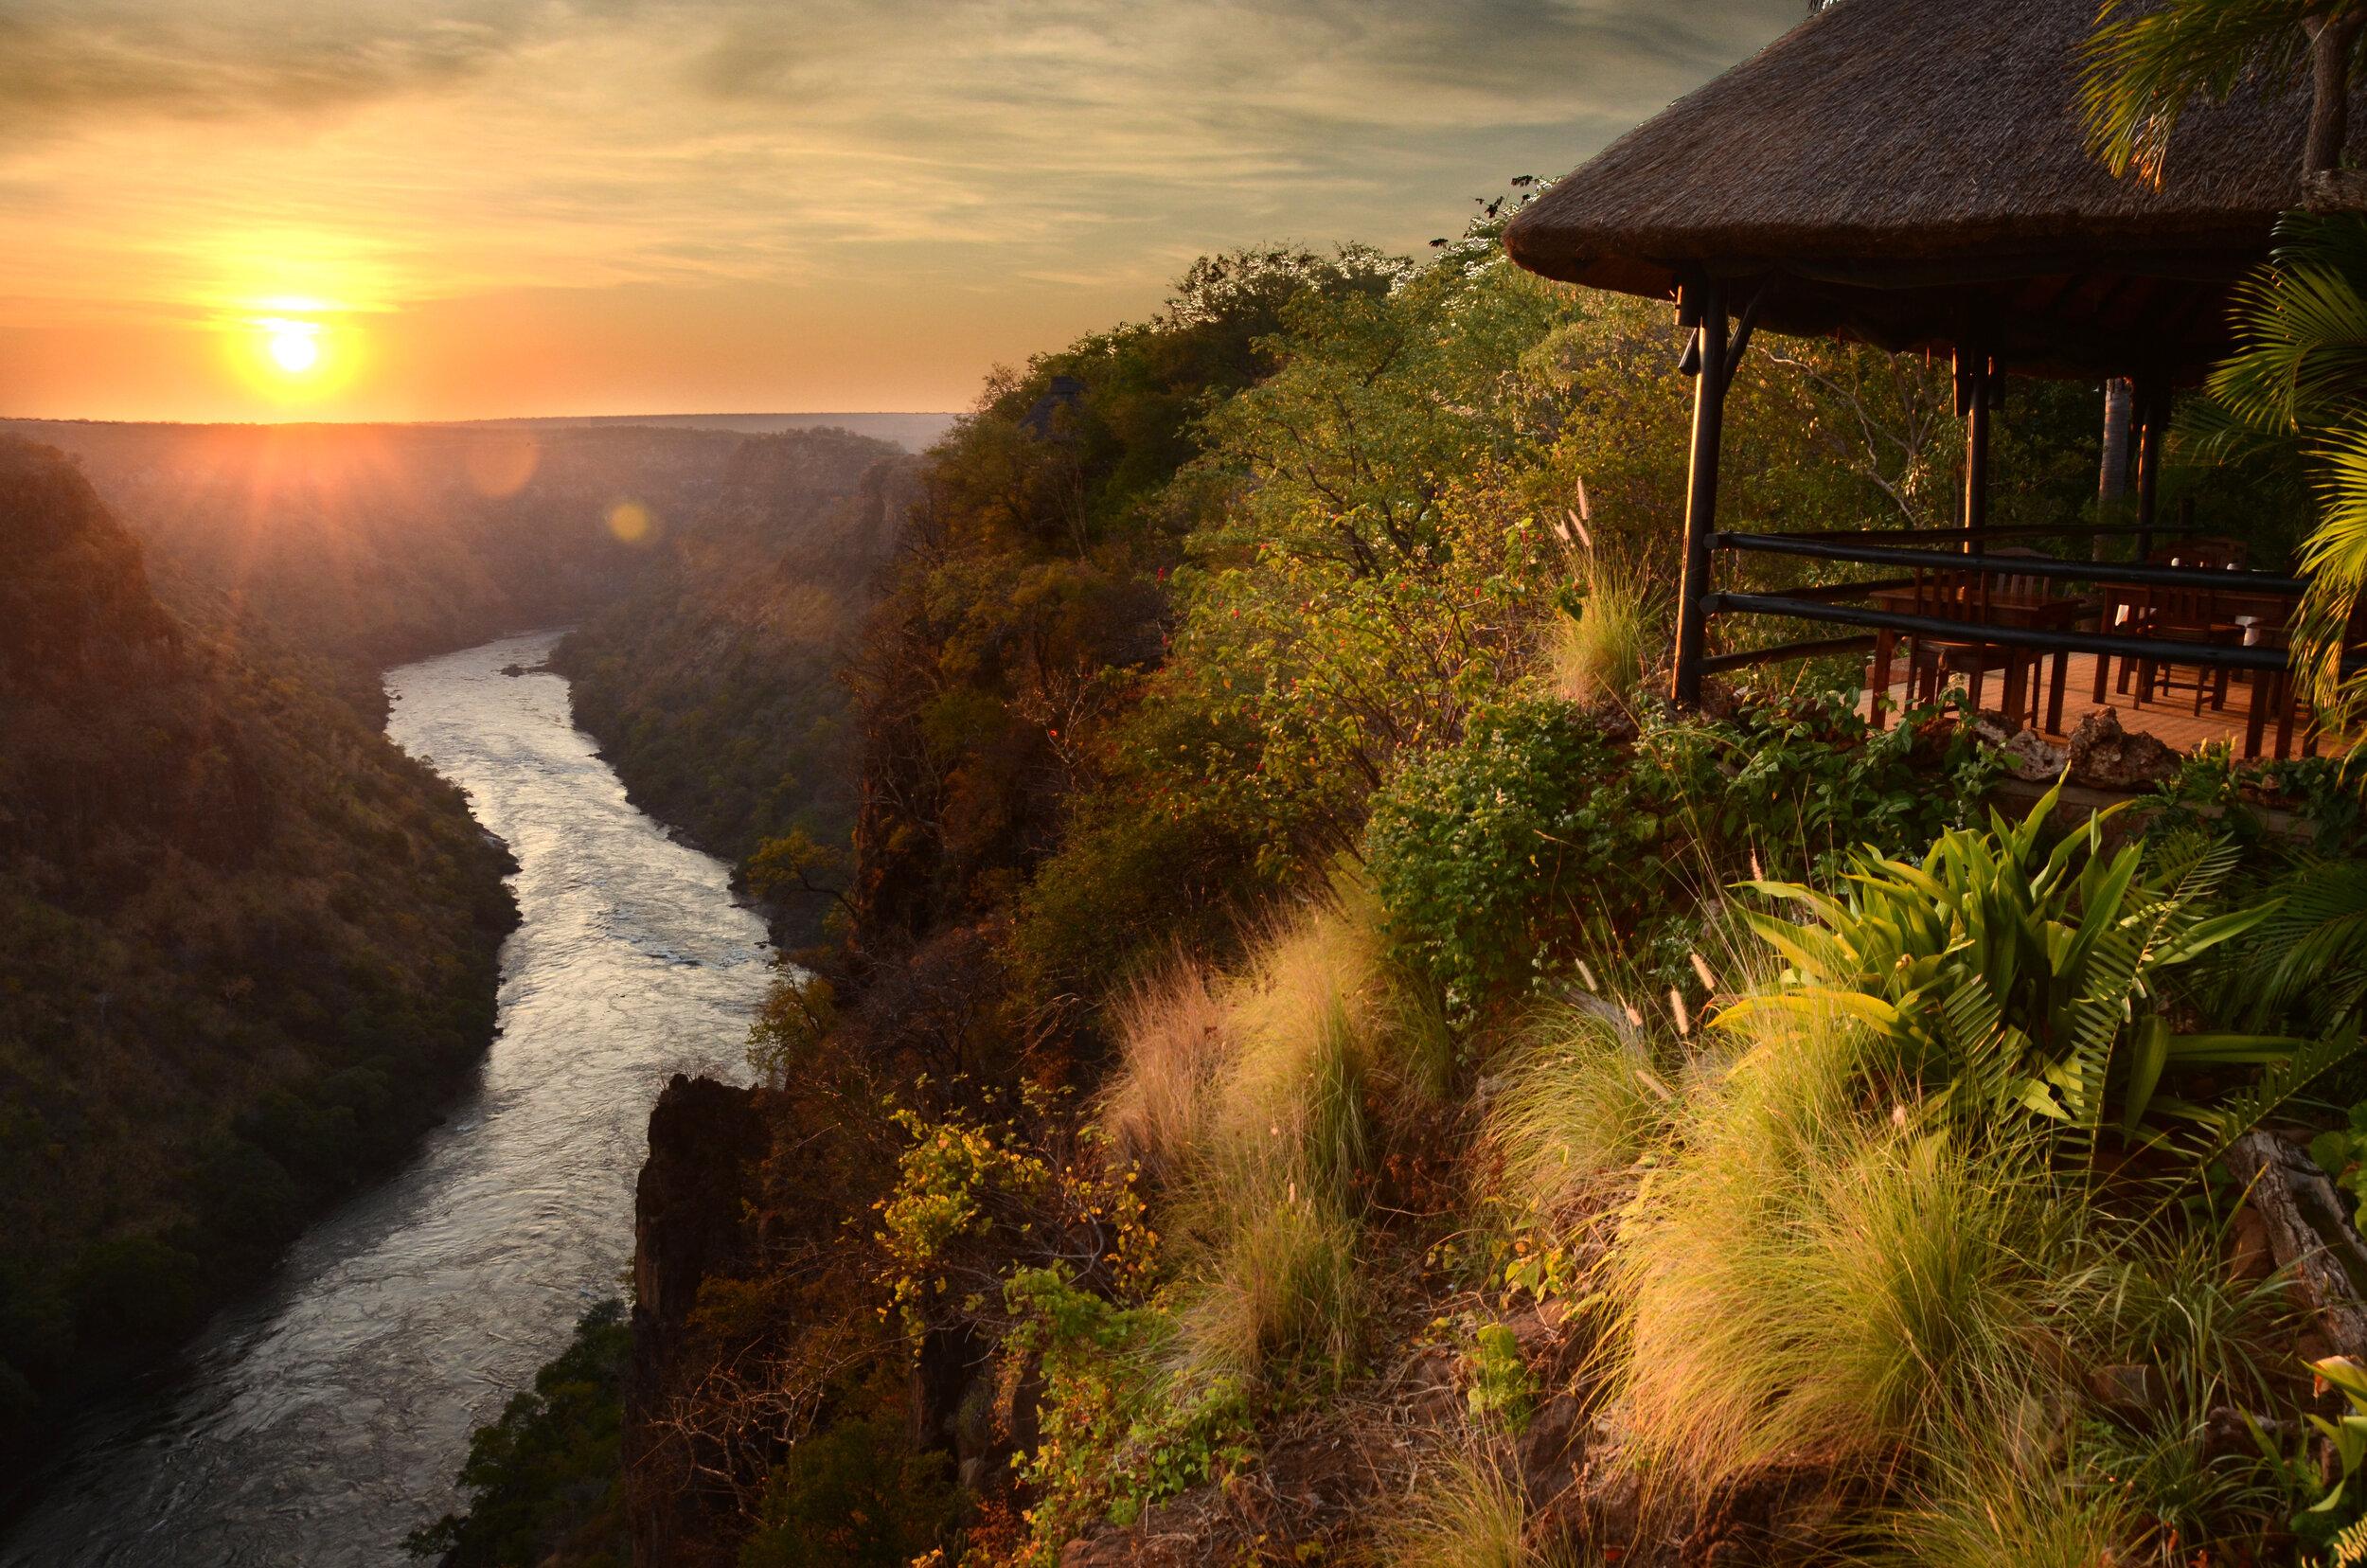 10._imvelo_safari_lodges_-_gorges_lodge_-the_mighty_zambezi_thunders_250_metres_below.jpg